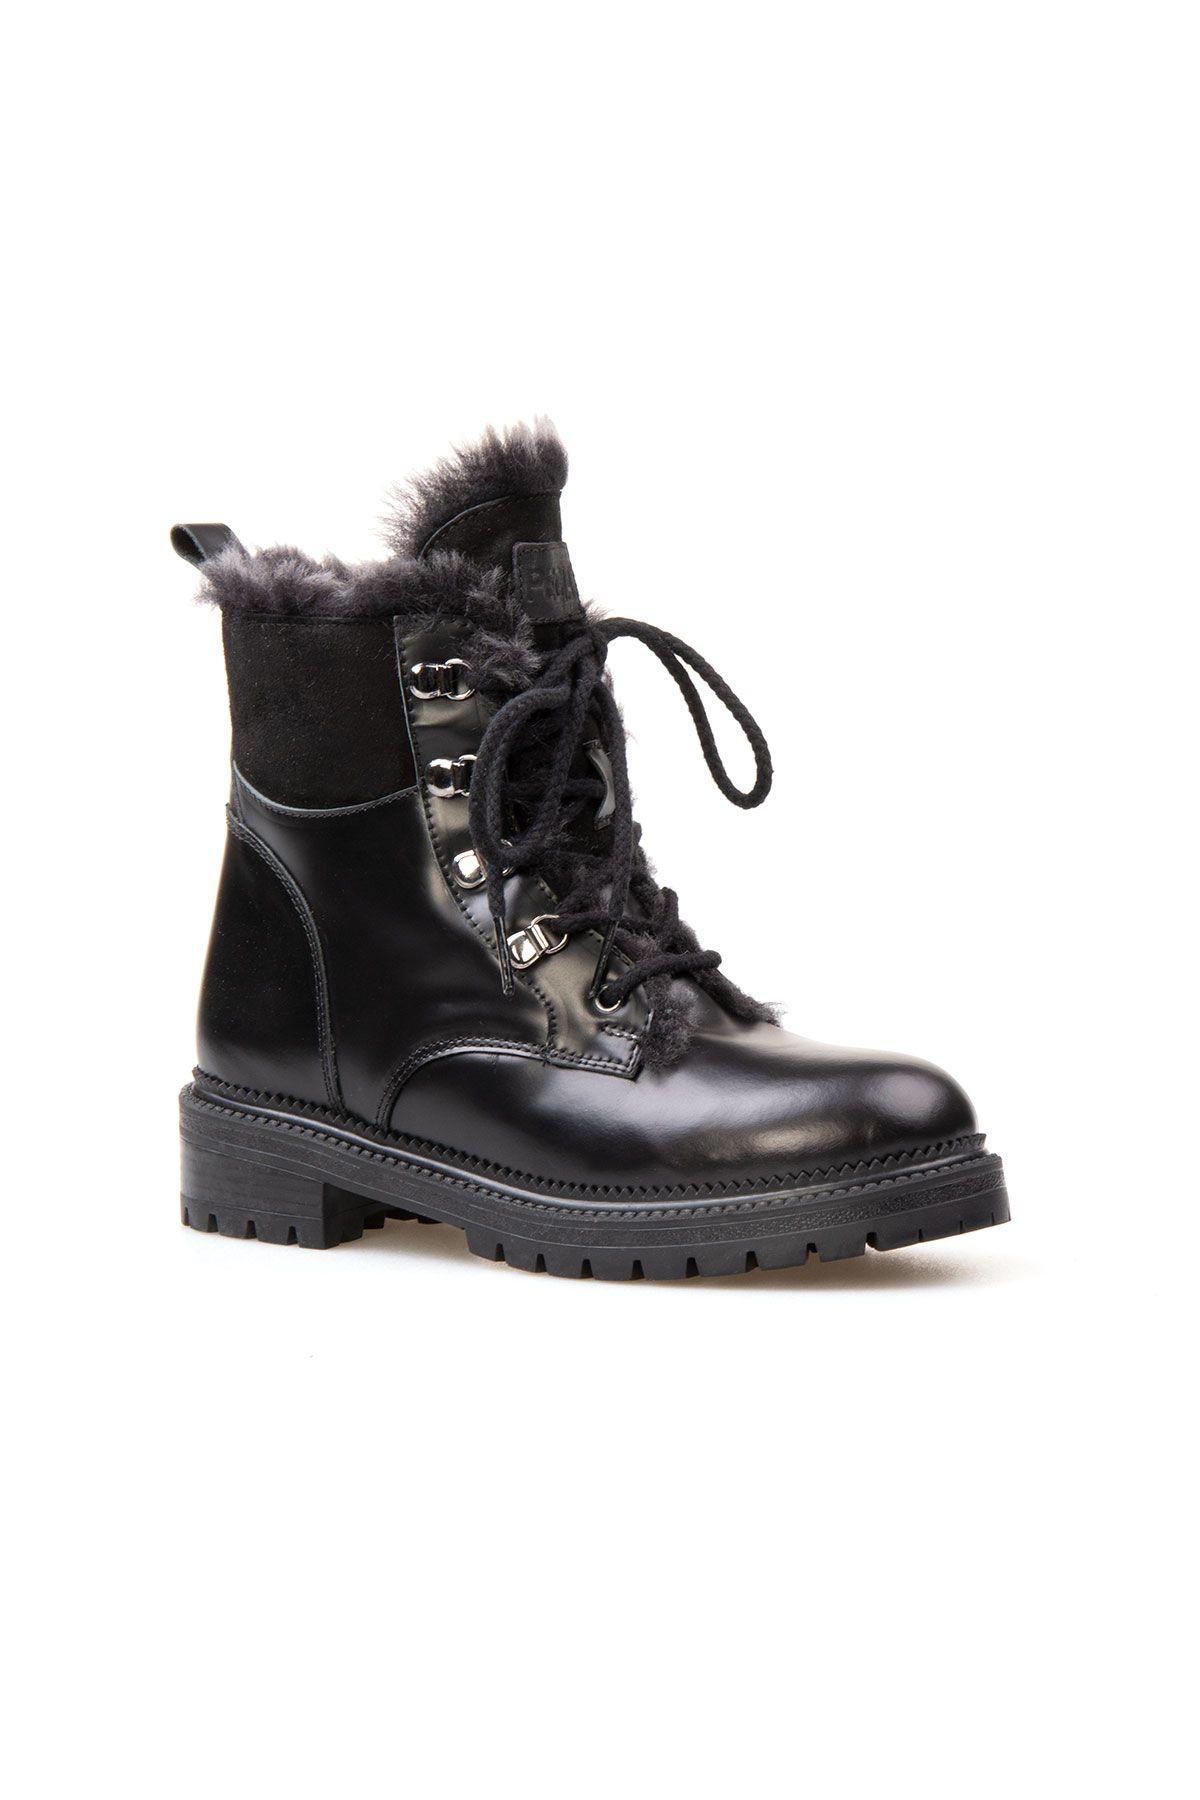 Pegia Genuine Sheepskin Women's Boots 391023 Black